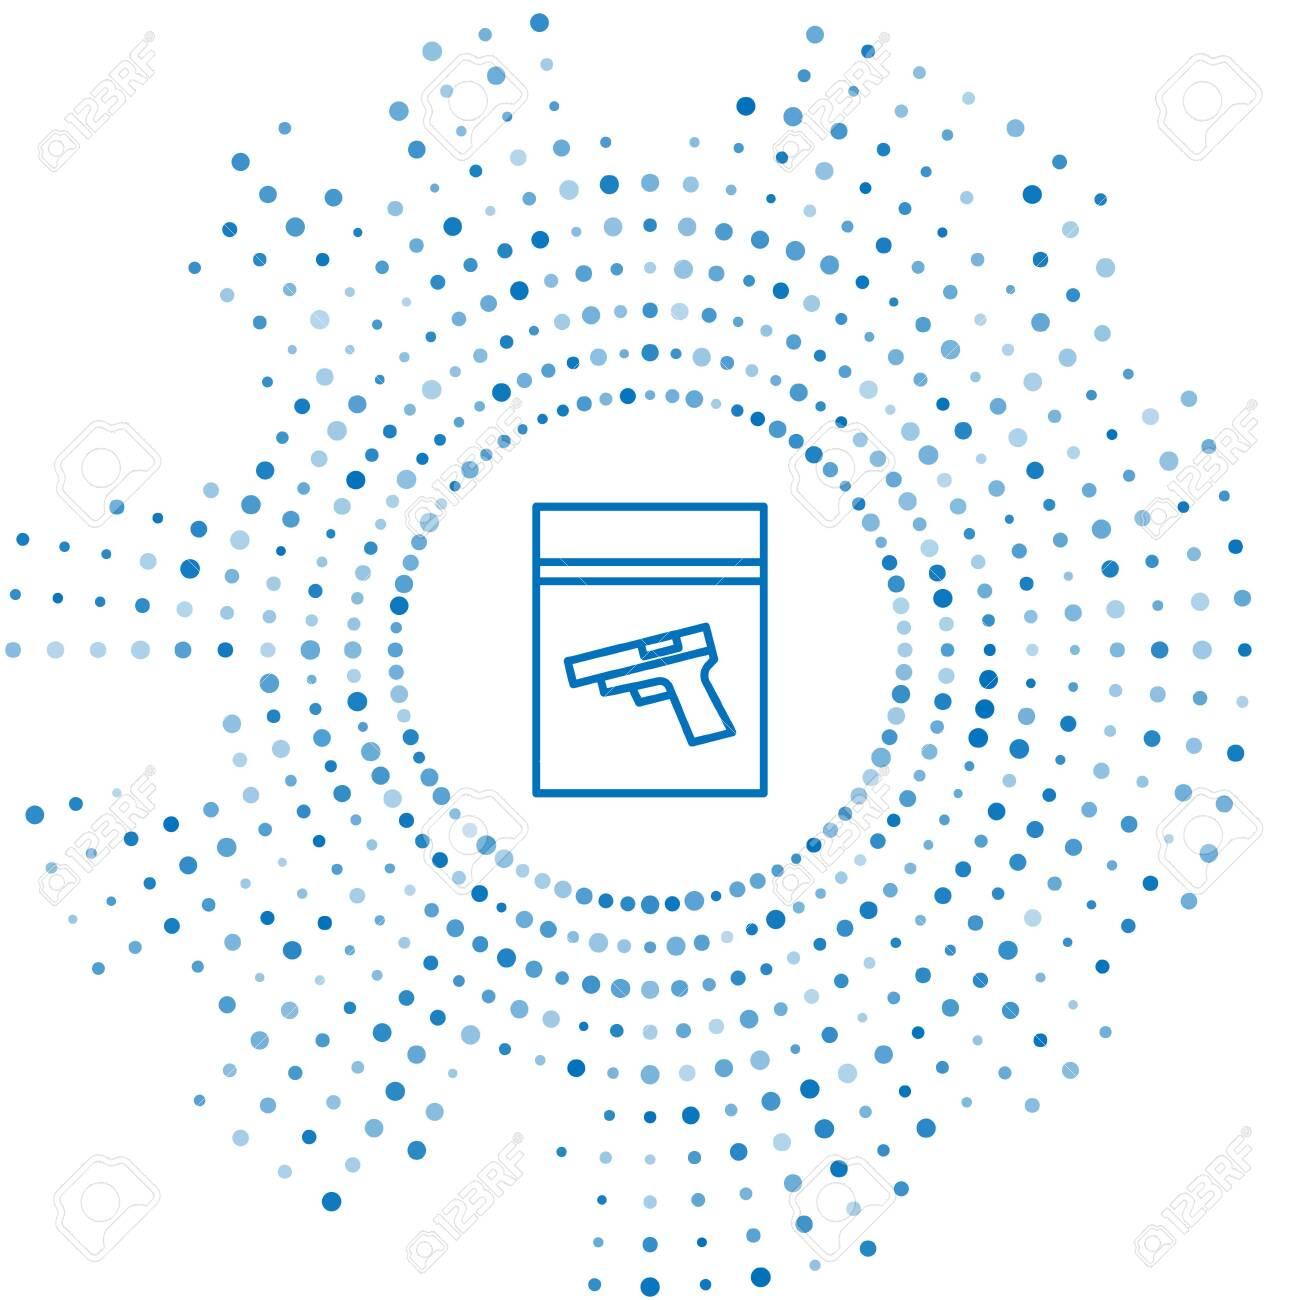 Evidence Vector SVG Icon (9) - SVG Repo